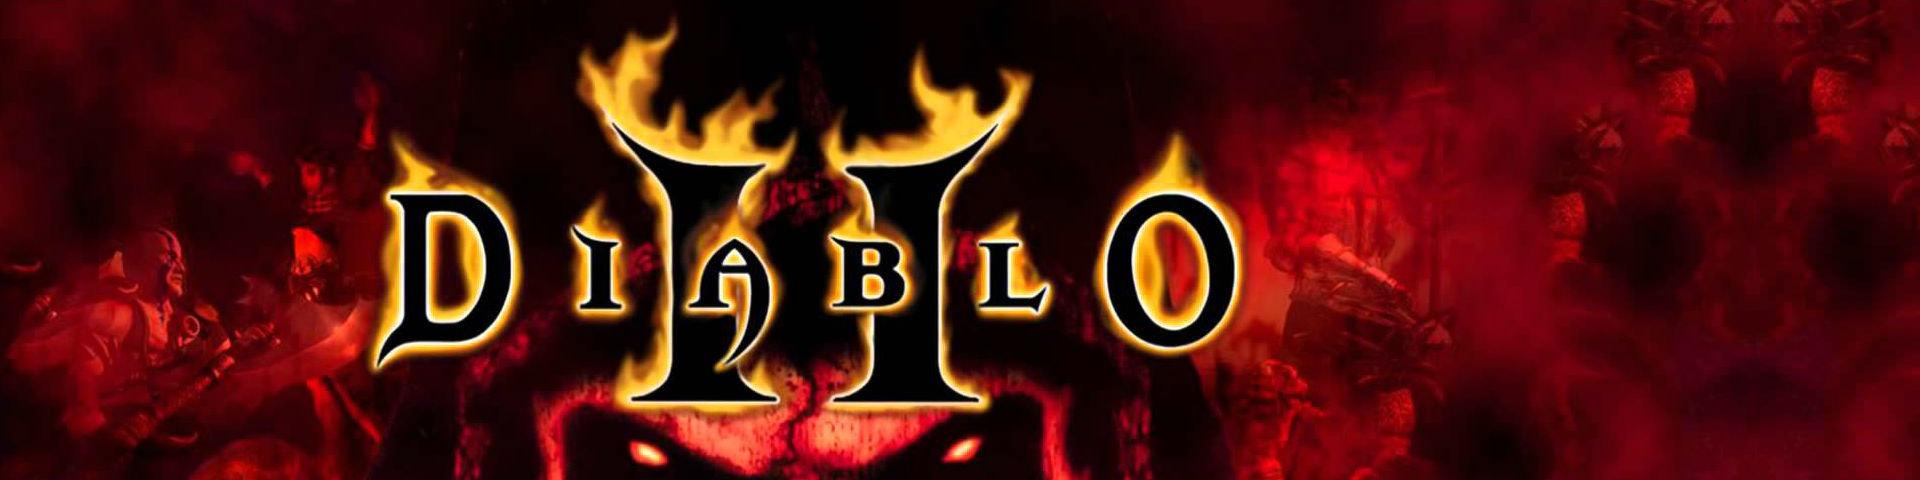 16440-the-new-diablo-ii-patch-is-here-wa